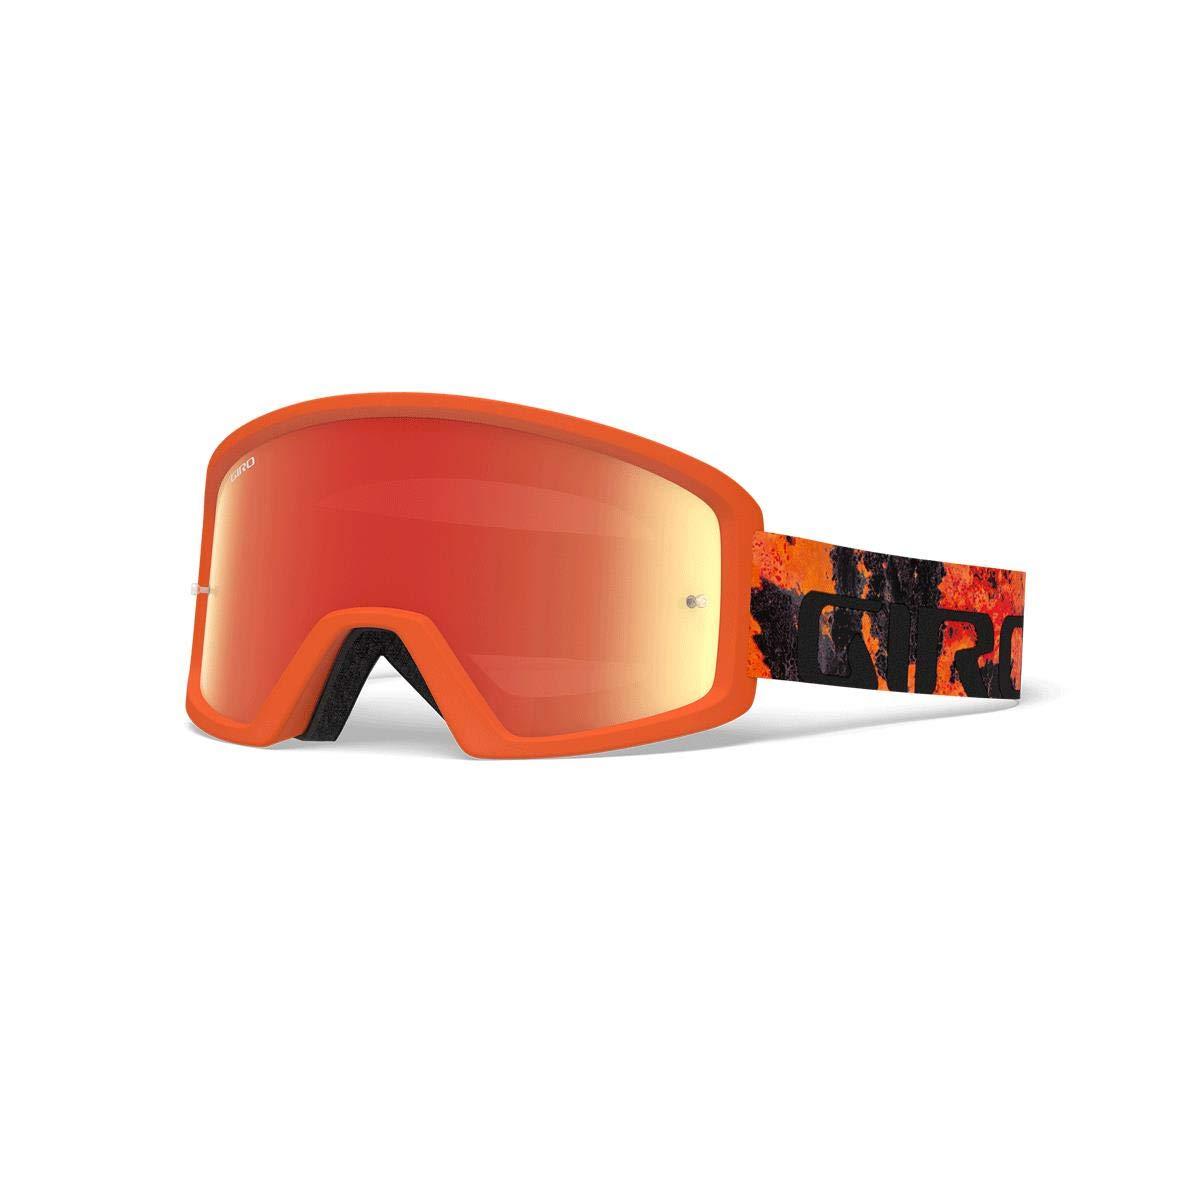 Giro Tazz MTB Goggle Lava, Amber Clear 2019 Goggles